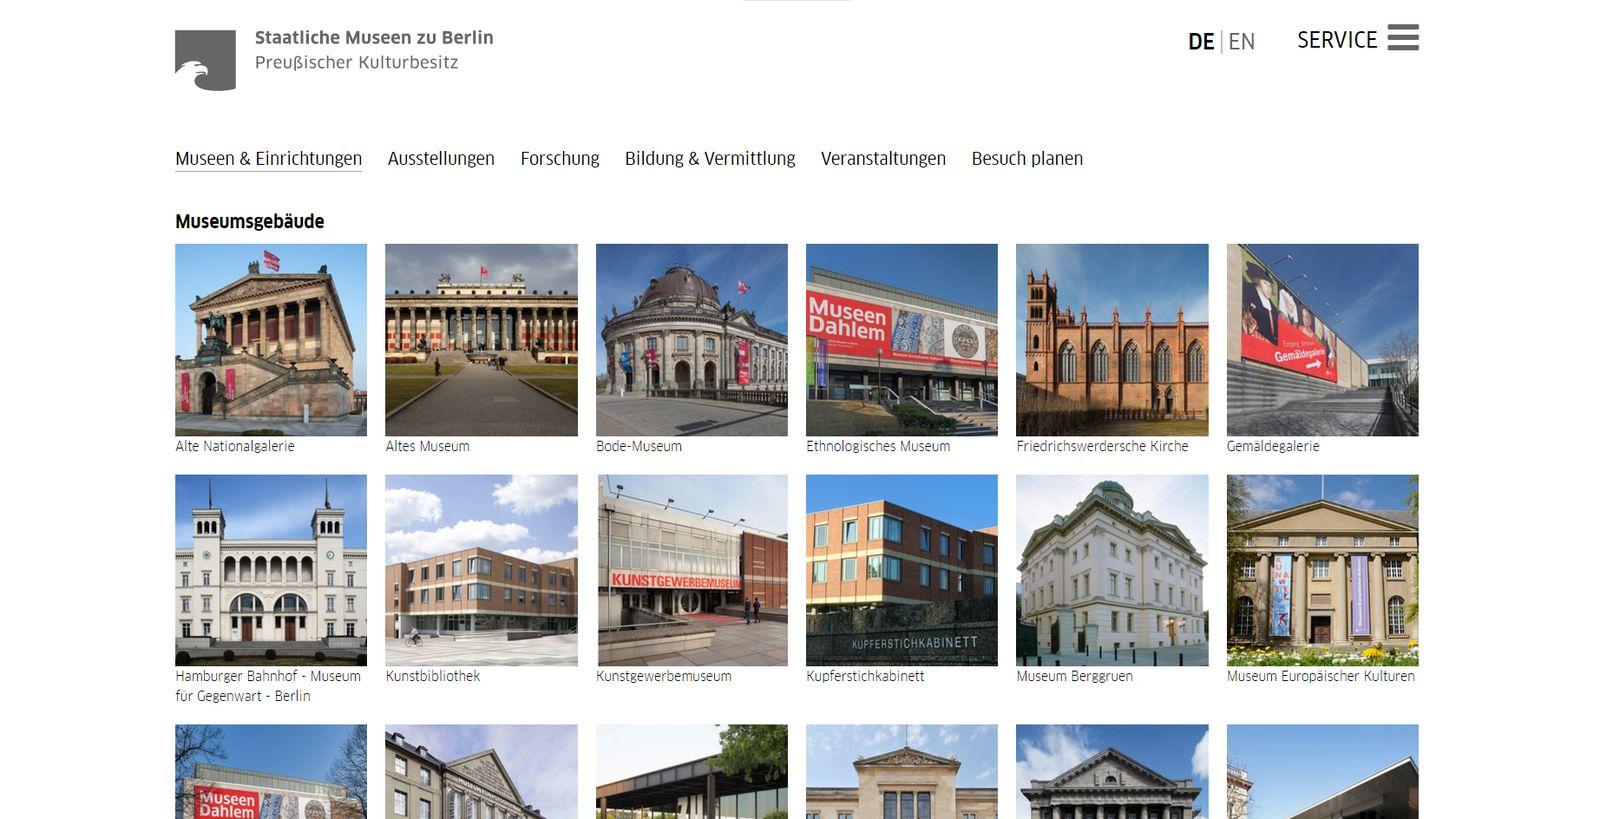 Screenshot der Seite Museumsgebäude